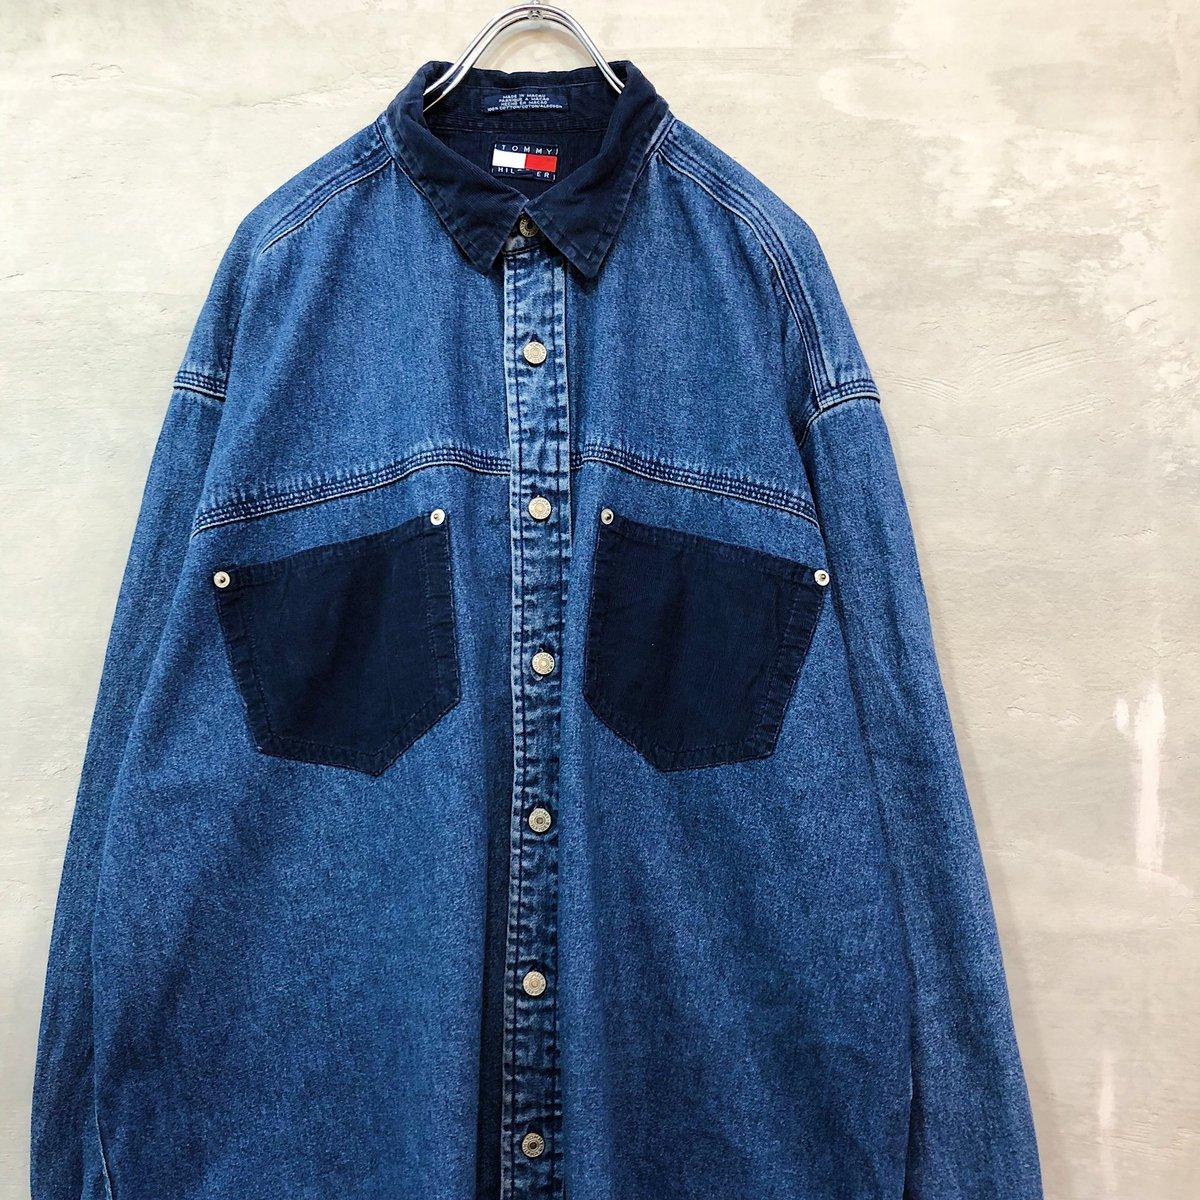 test ツイッターメディア - 店舗にて、 TOMMY NAUTICA Ralph の90'sシャツが大量入荷しました❗️ どれもイッテンモノですので、お探しの方はお早めに💨💨  #久留米 #福岡 #佐賀 #熊本 #大分 #古着 #古着屋 https://t.co/ulWsN9nIAe